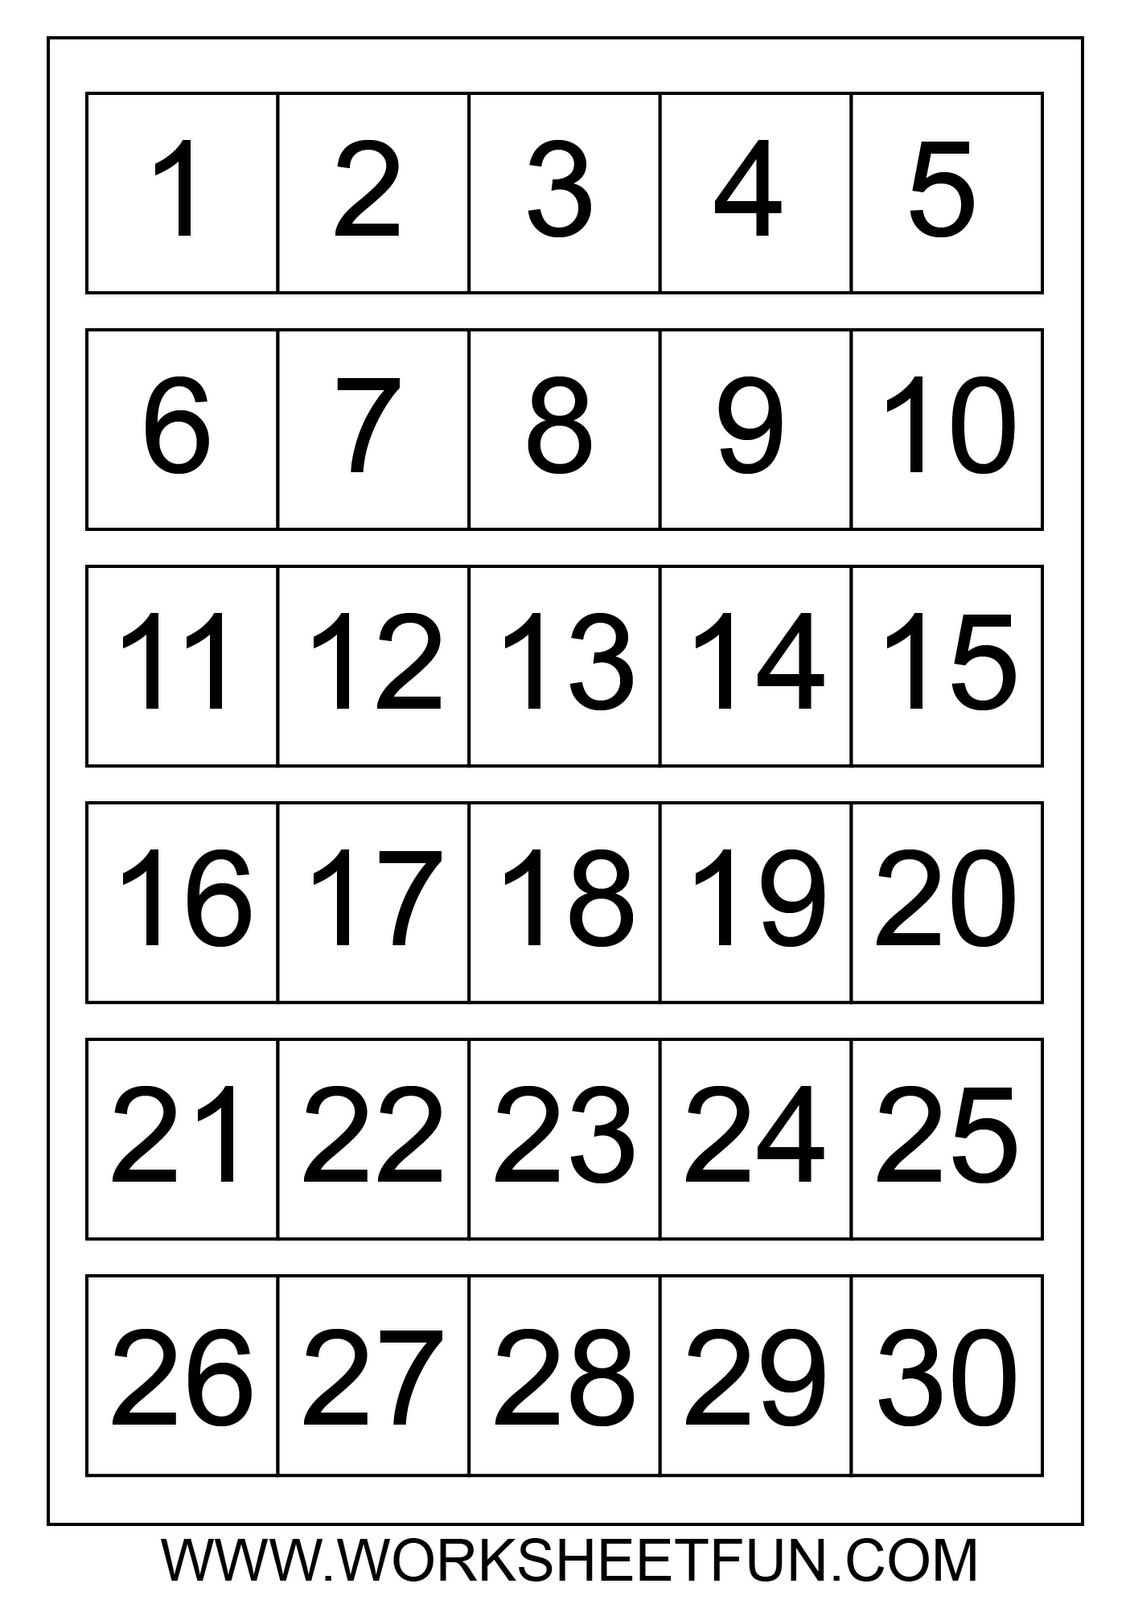 Printable Numbers 1-31 For Calendar - Calendar Inspiration Free Printable Calendar Numbers 1 31